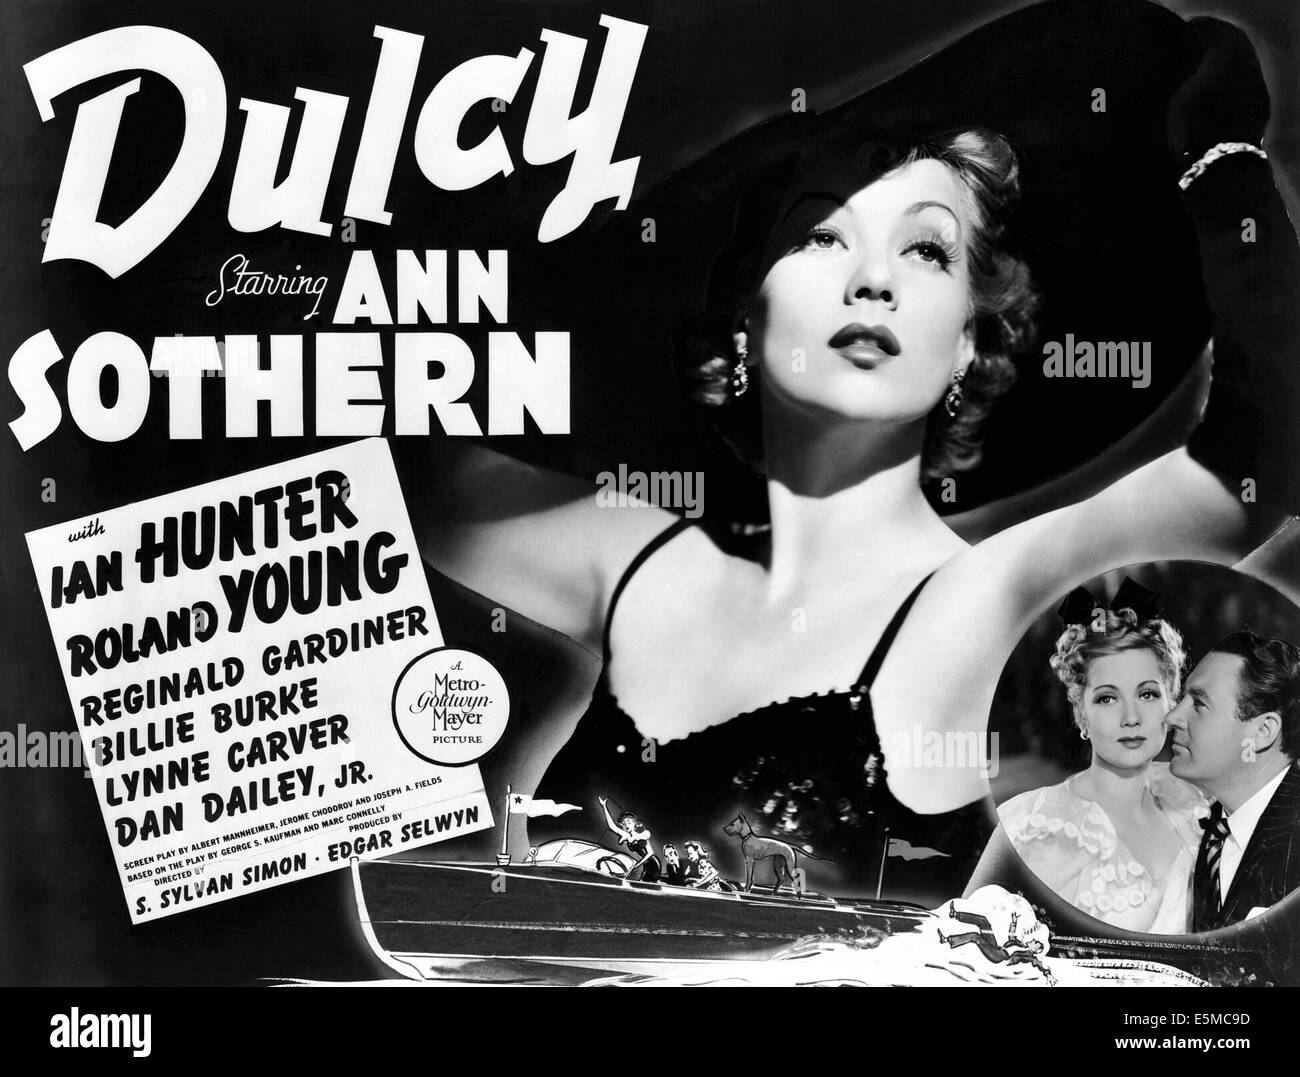 DULCY, Ann Sothern, Ian Hunter, 1940 - Stock Image